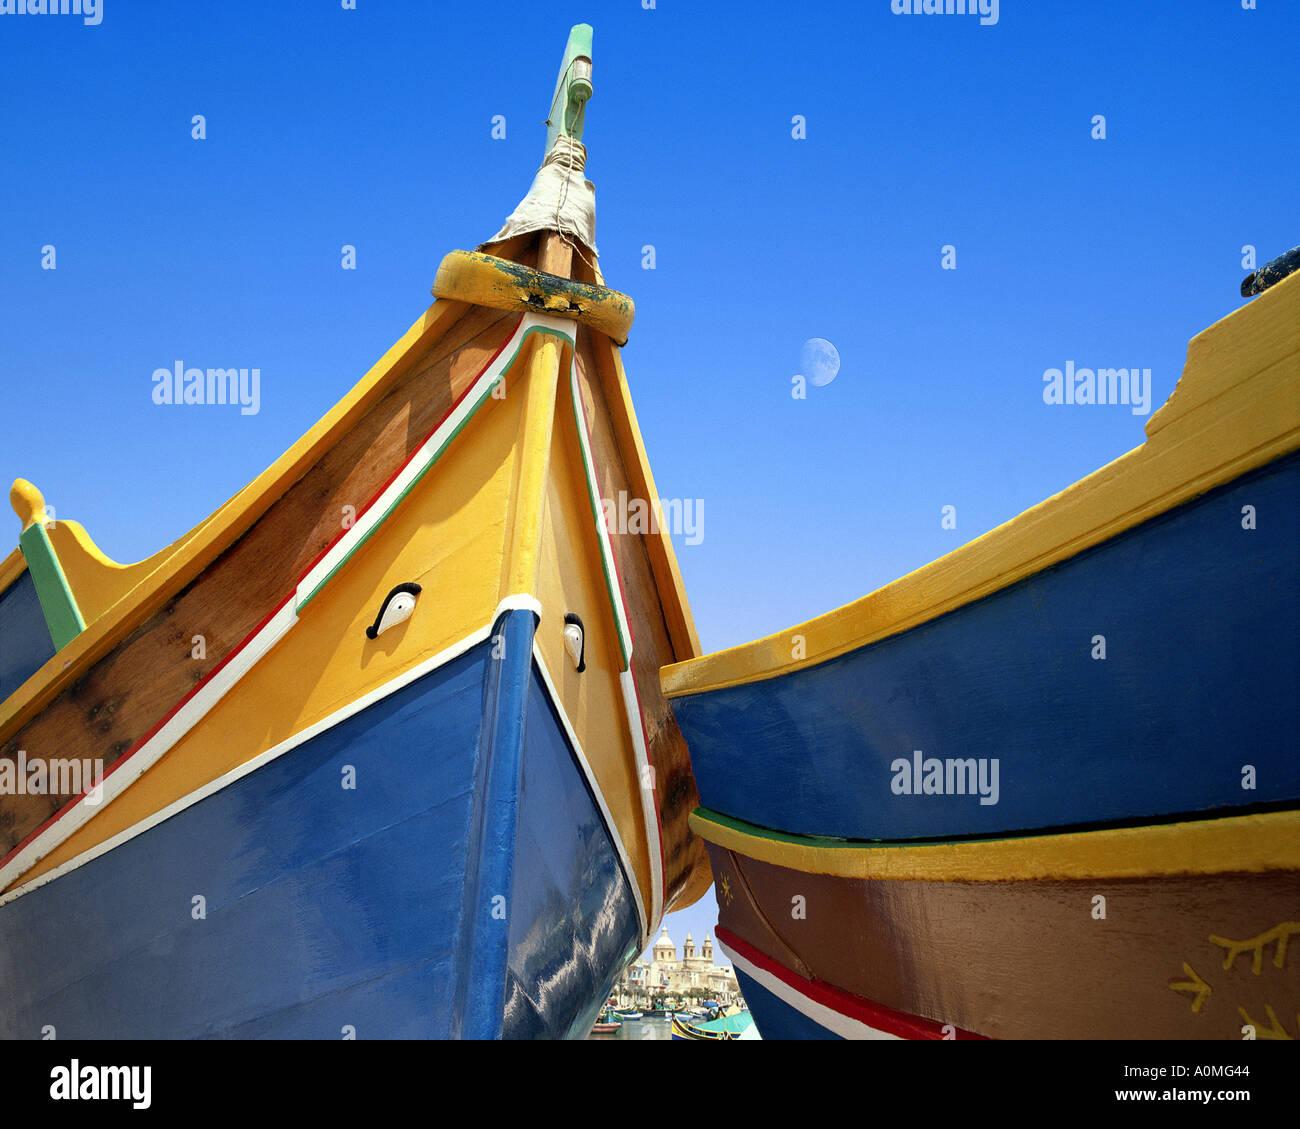 MT - MALTA: típicos barcos malteses en Marsaxlokk Harbour Imagen De Stock